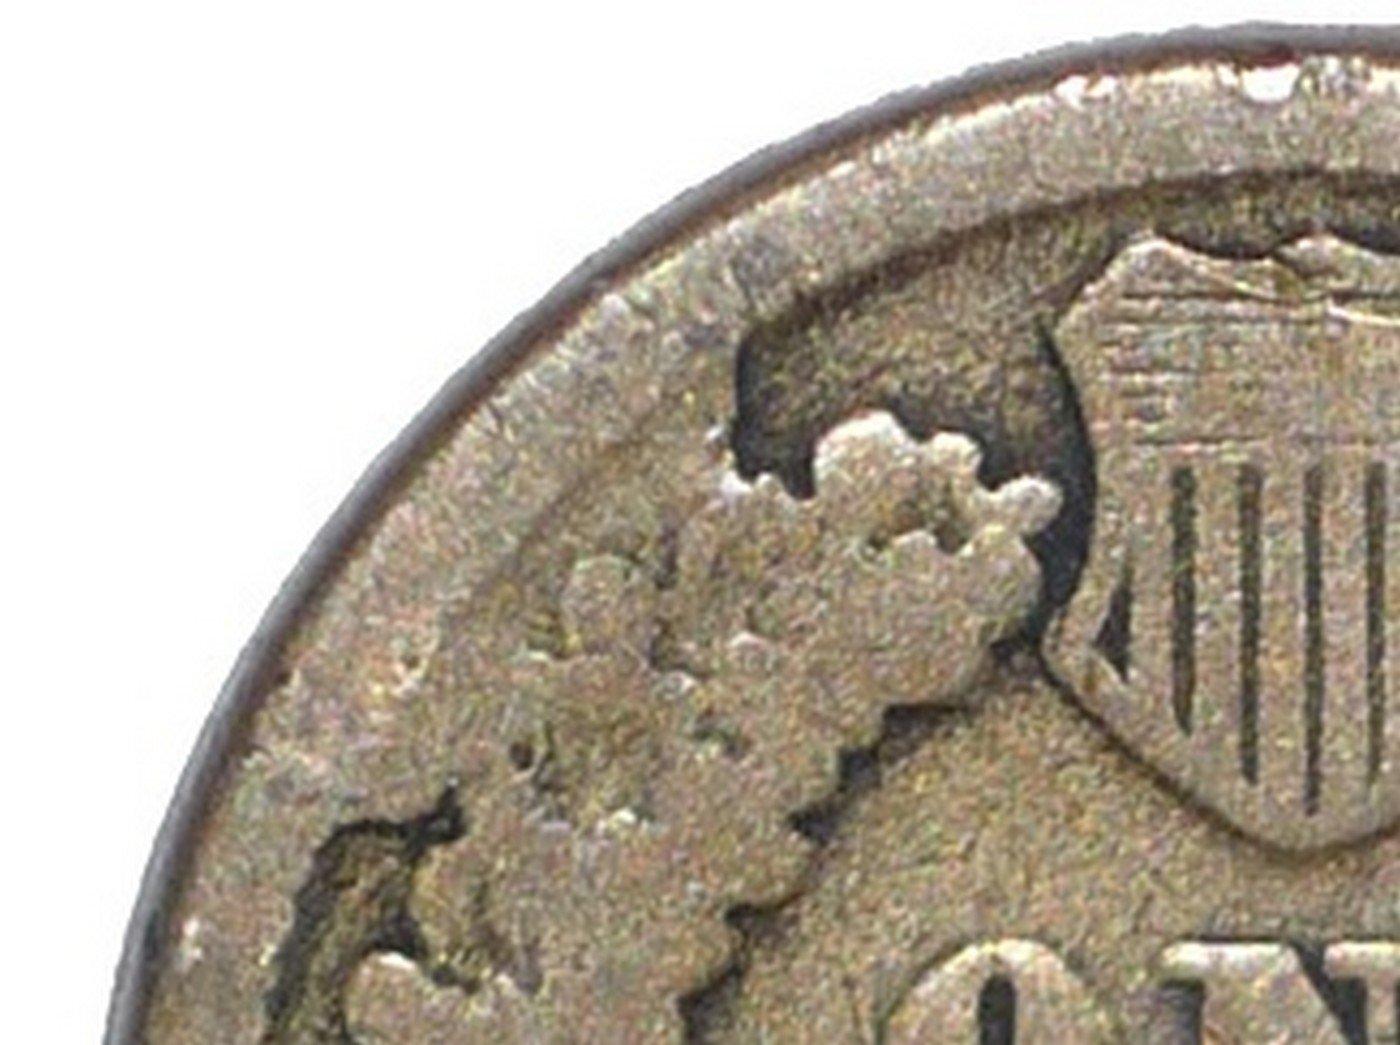 1863 ODD-008, CUD-019 - Indian Head Penny - Photo by David Poliquin